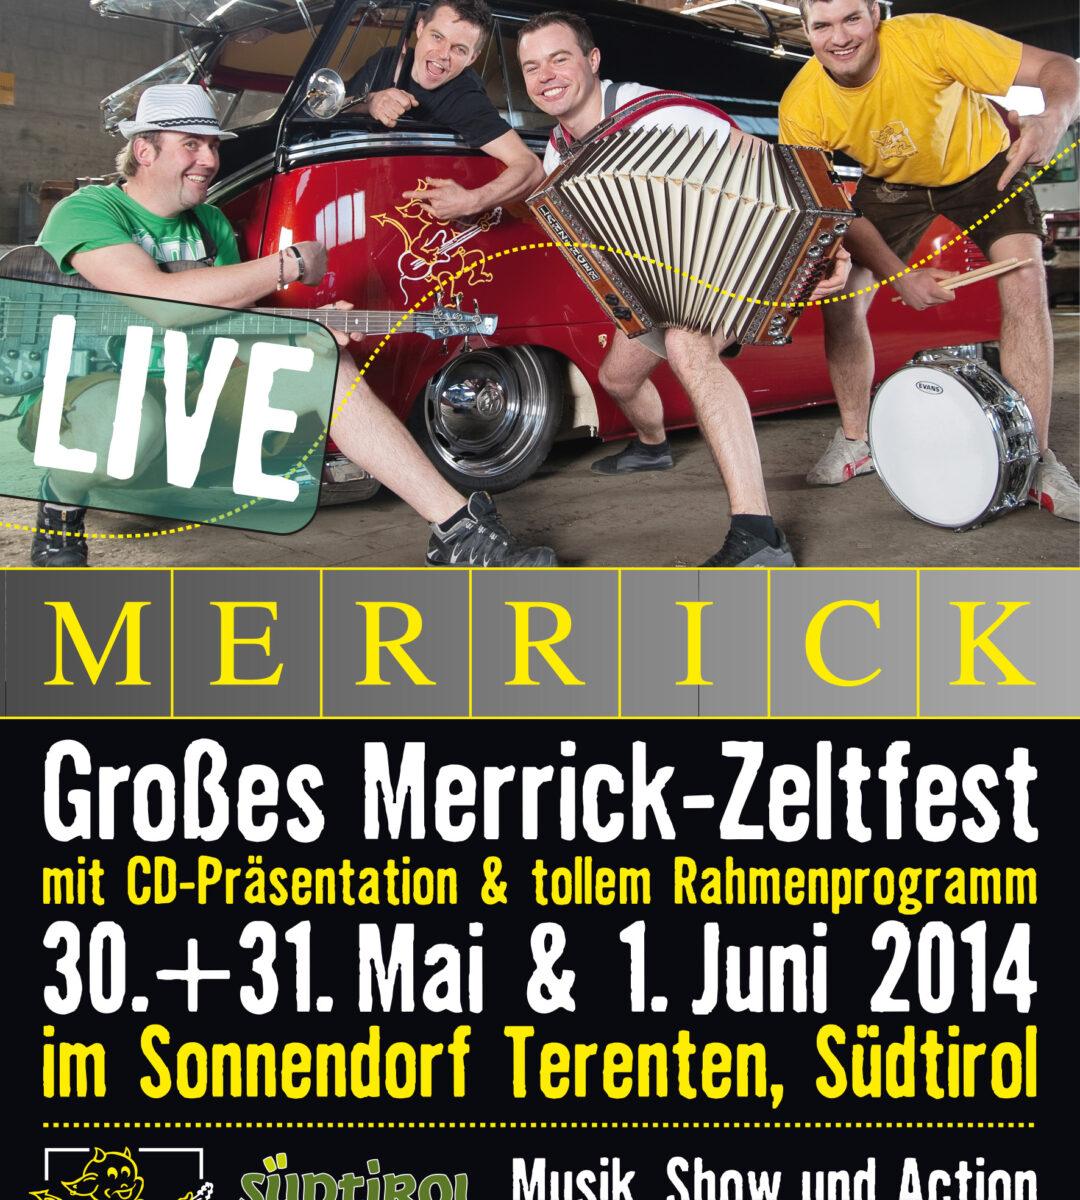 240513-Gerryland-Merrick.LIT.fh